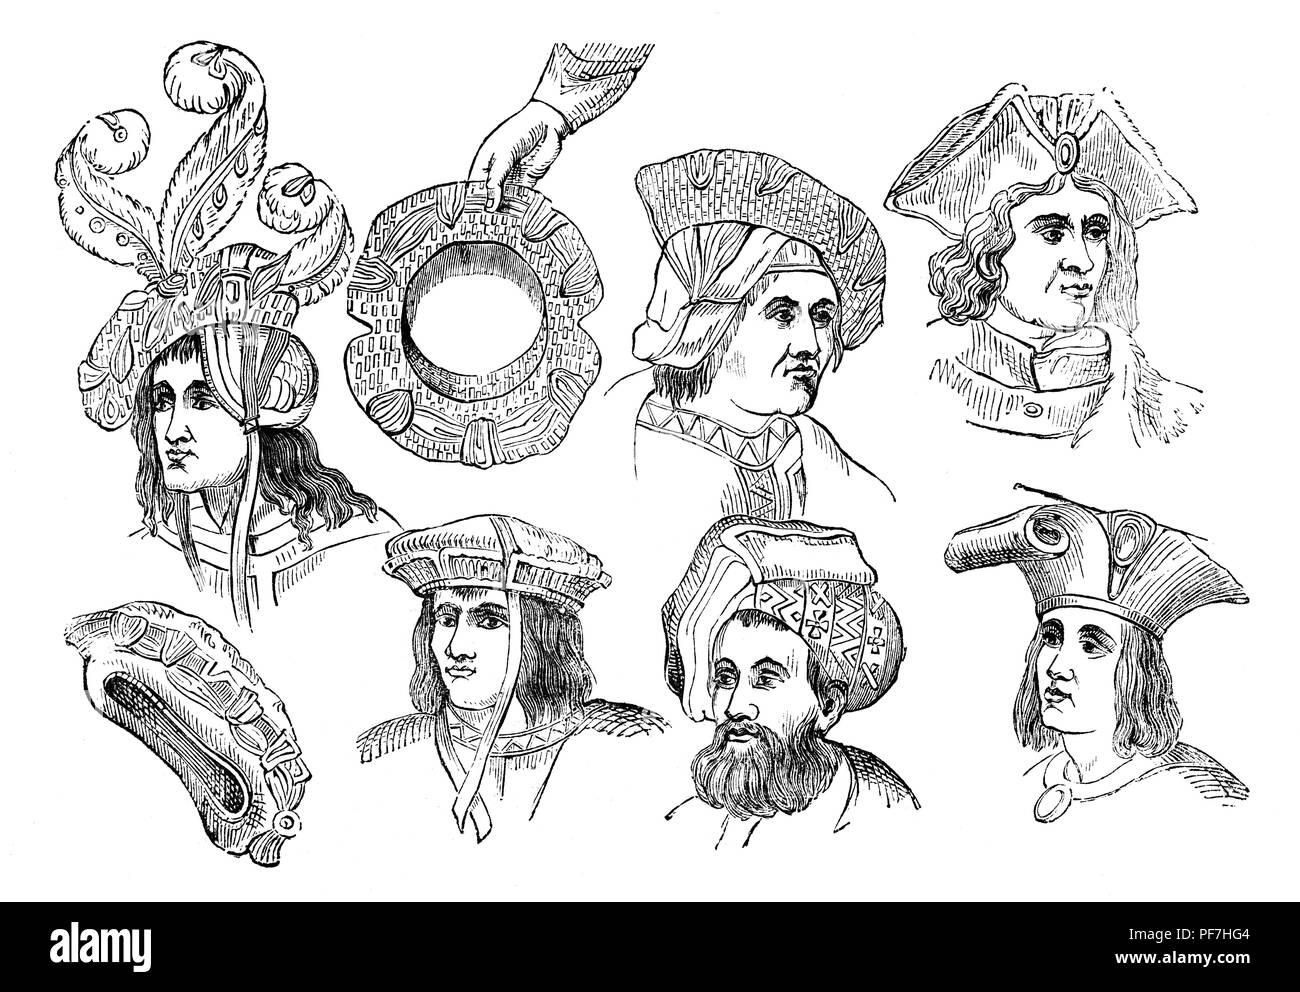 Fashion: 16th Century Men's head dresses. - Stock Image